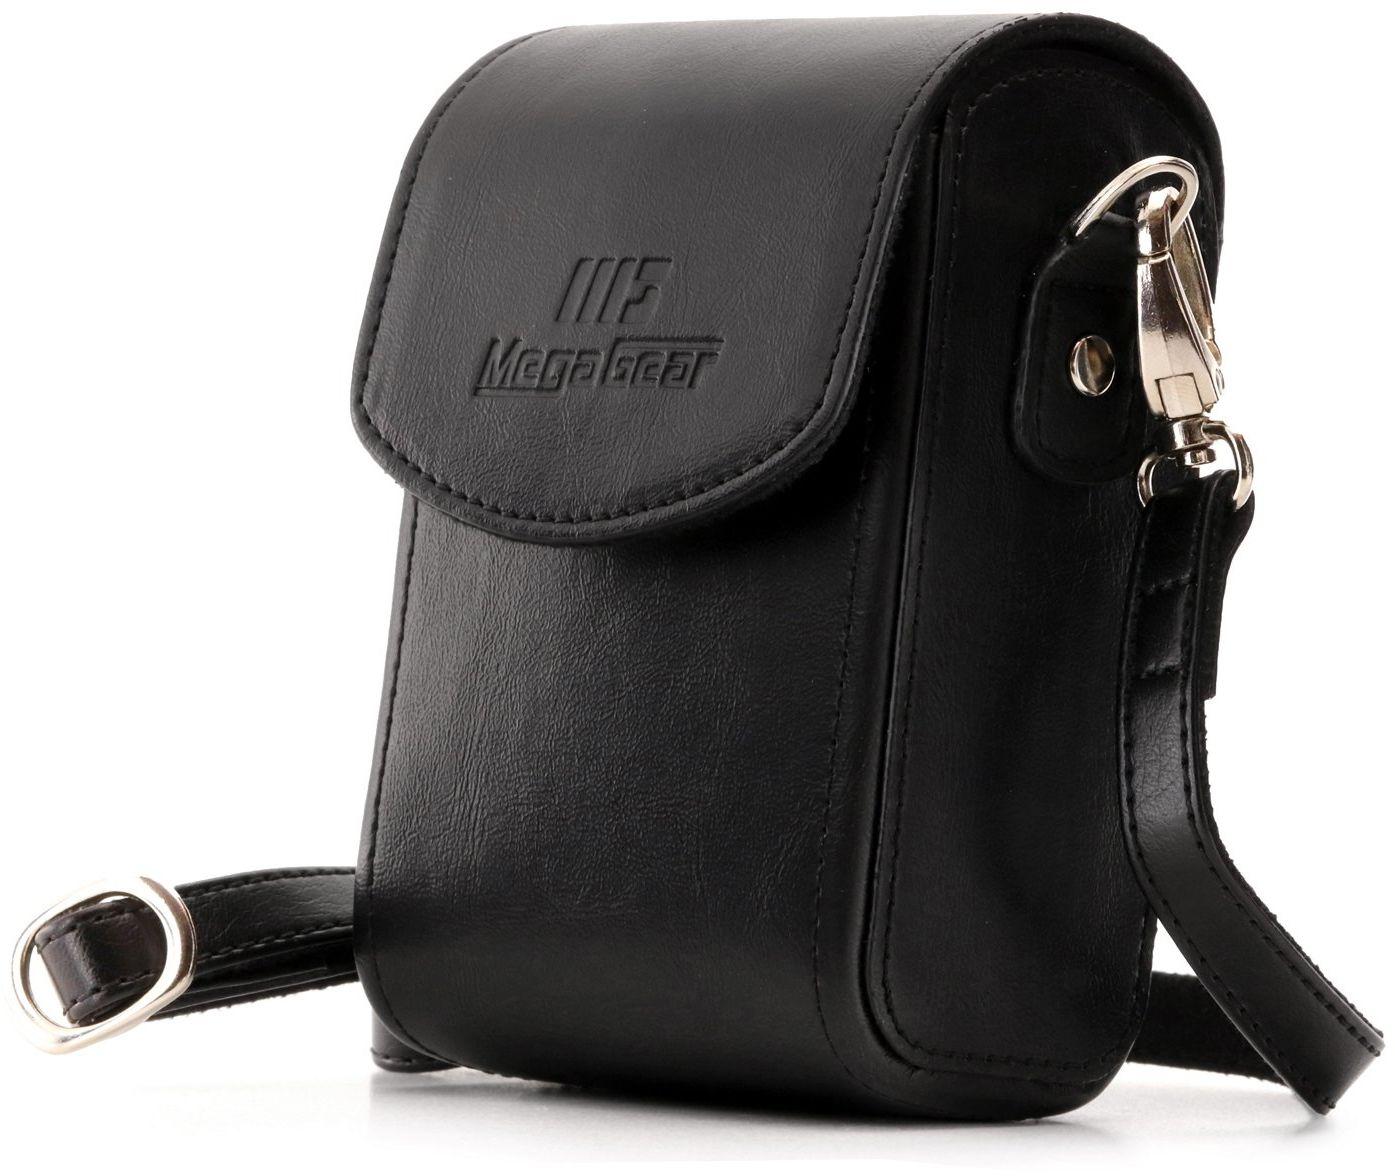 MegaGear MG882 Nikon Coolpix A1000, A900 skórzana torba na aparat z paskiem do noszenia - czarna